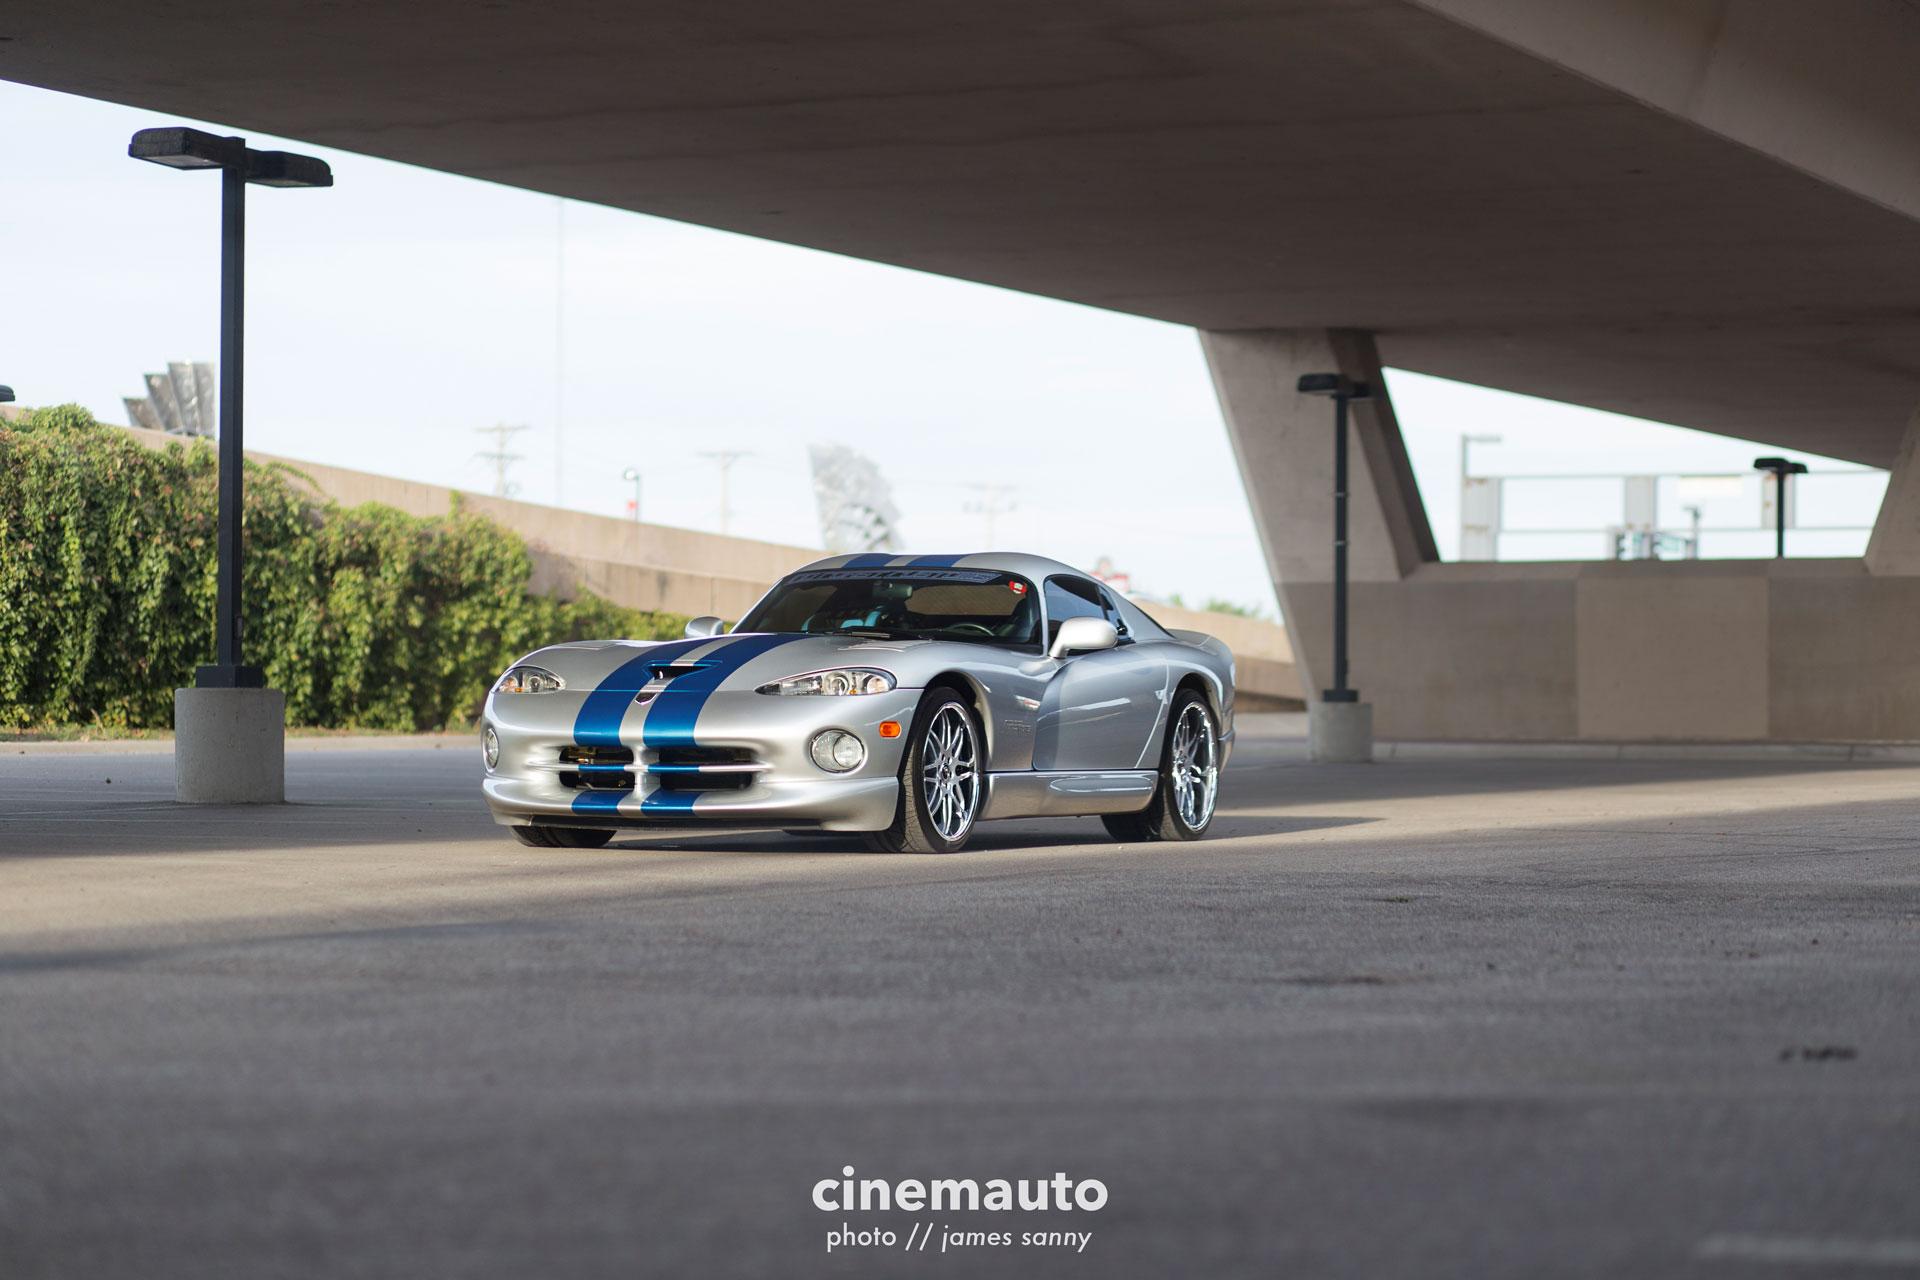 cinemauto-wichita-automotive-photography-ah3-sm.jpg